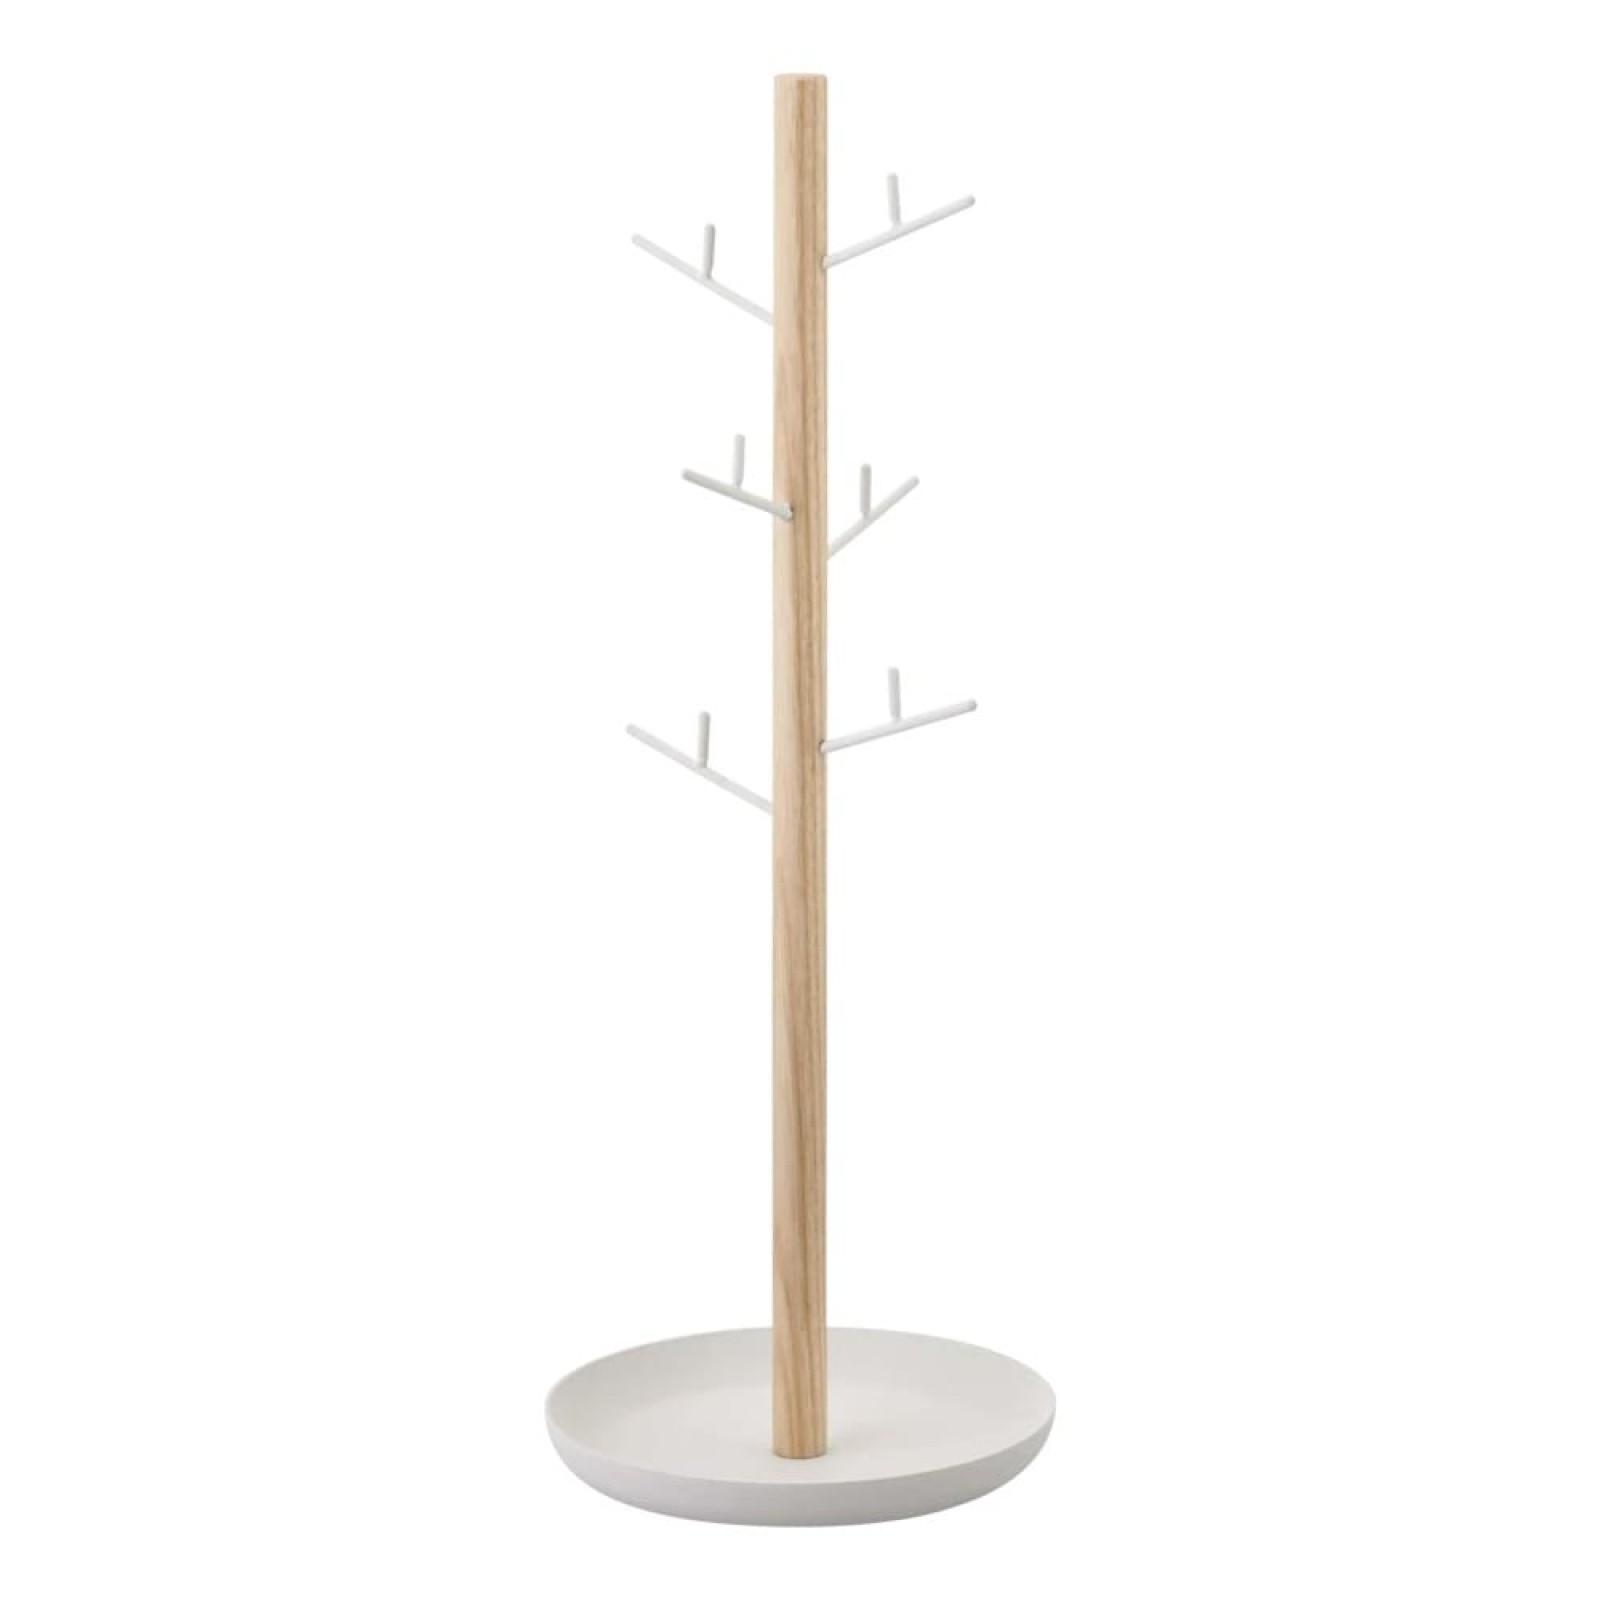 Tree Accessory Stand (White/ Ash) - Yamazaki